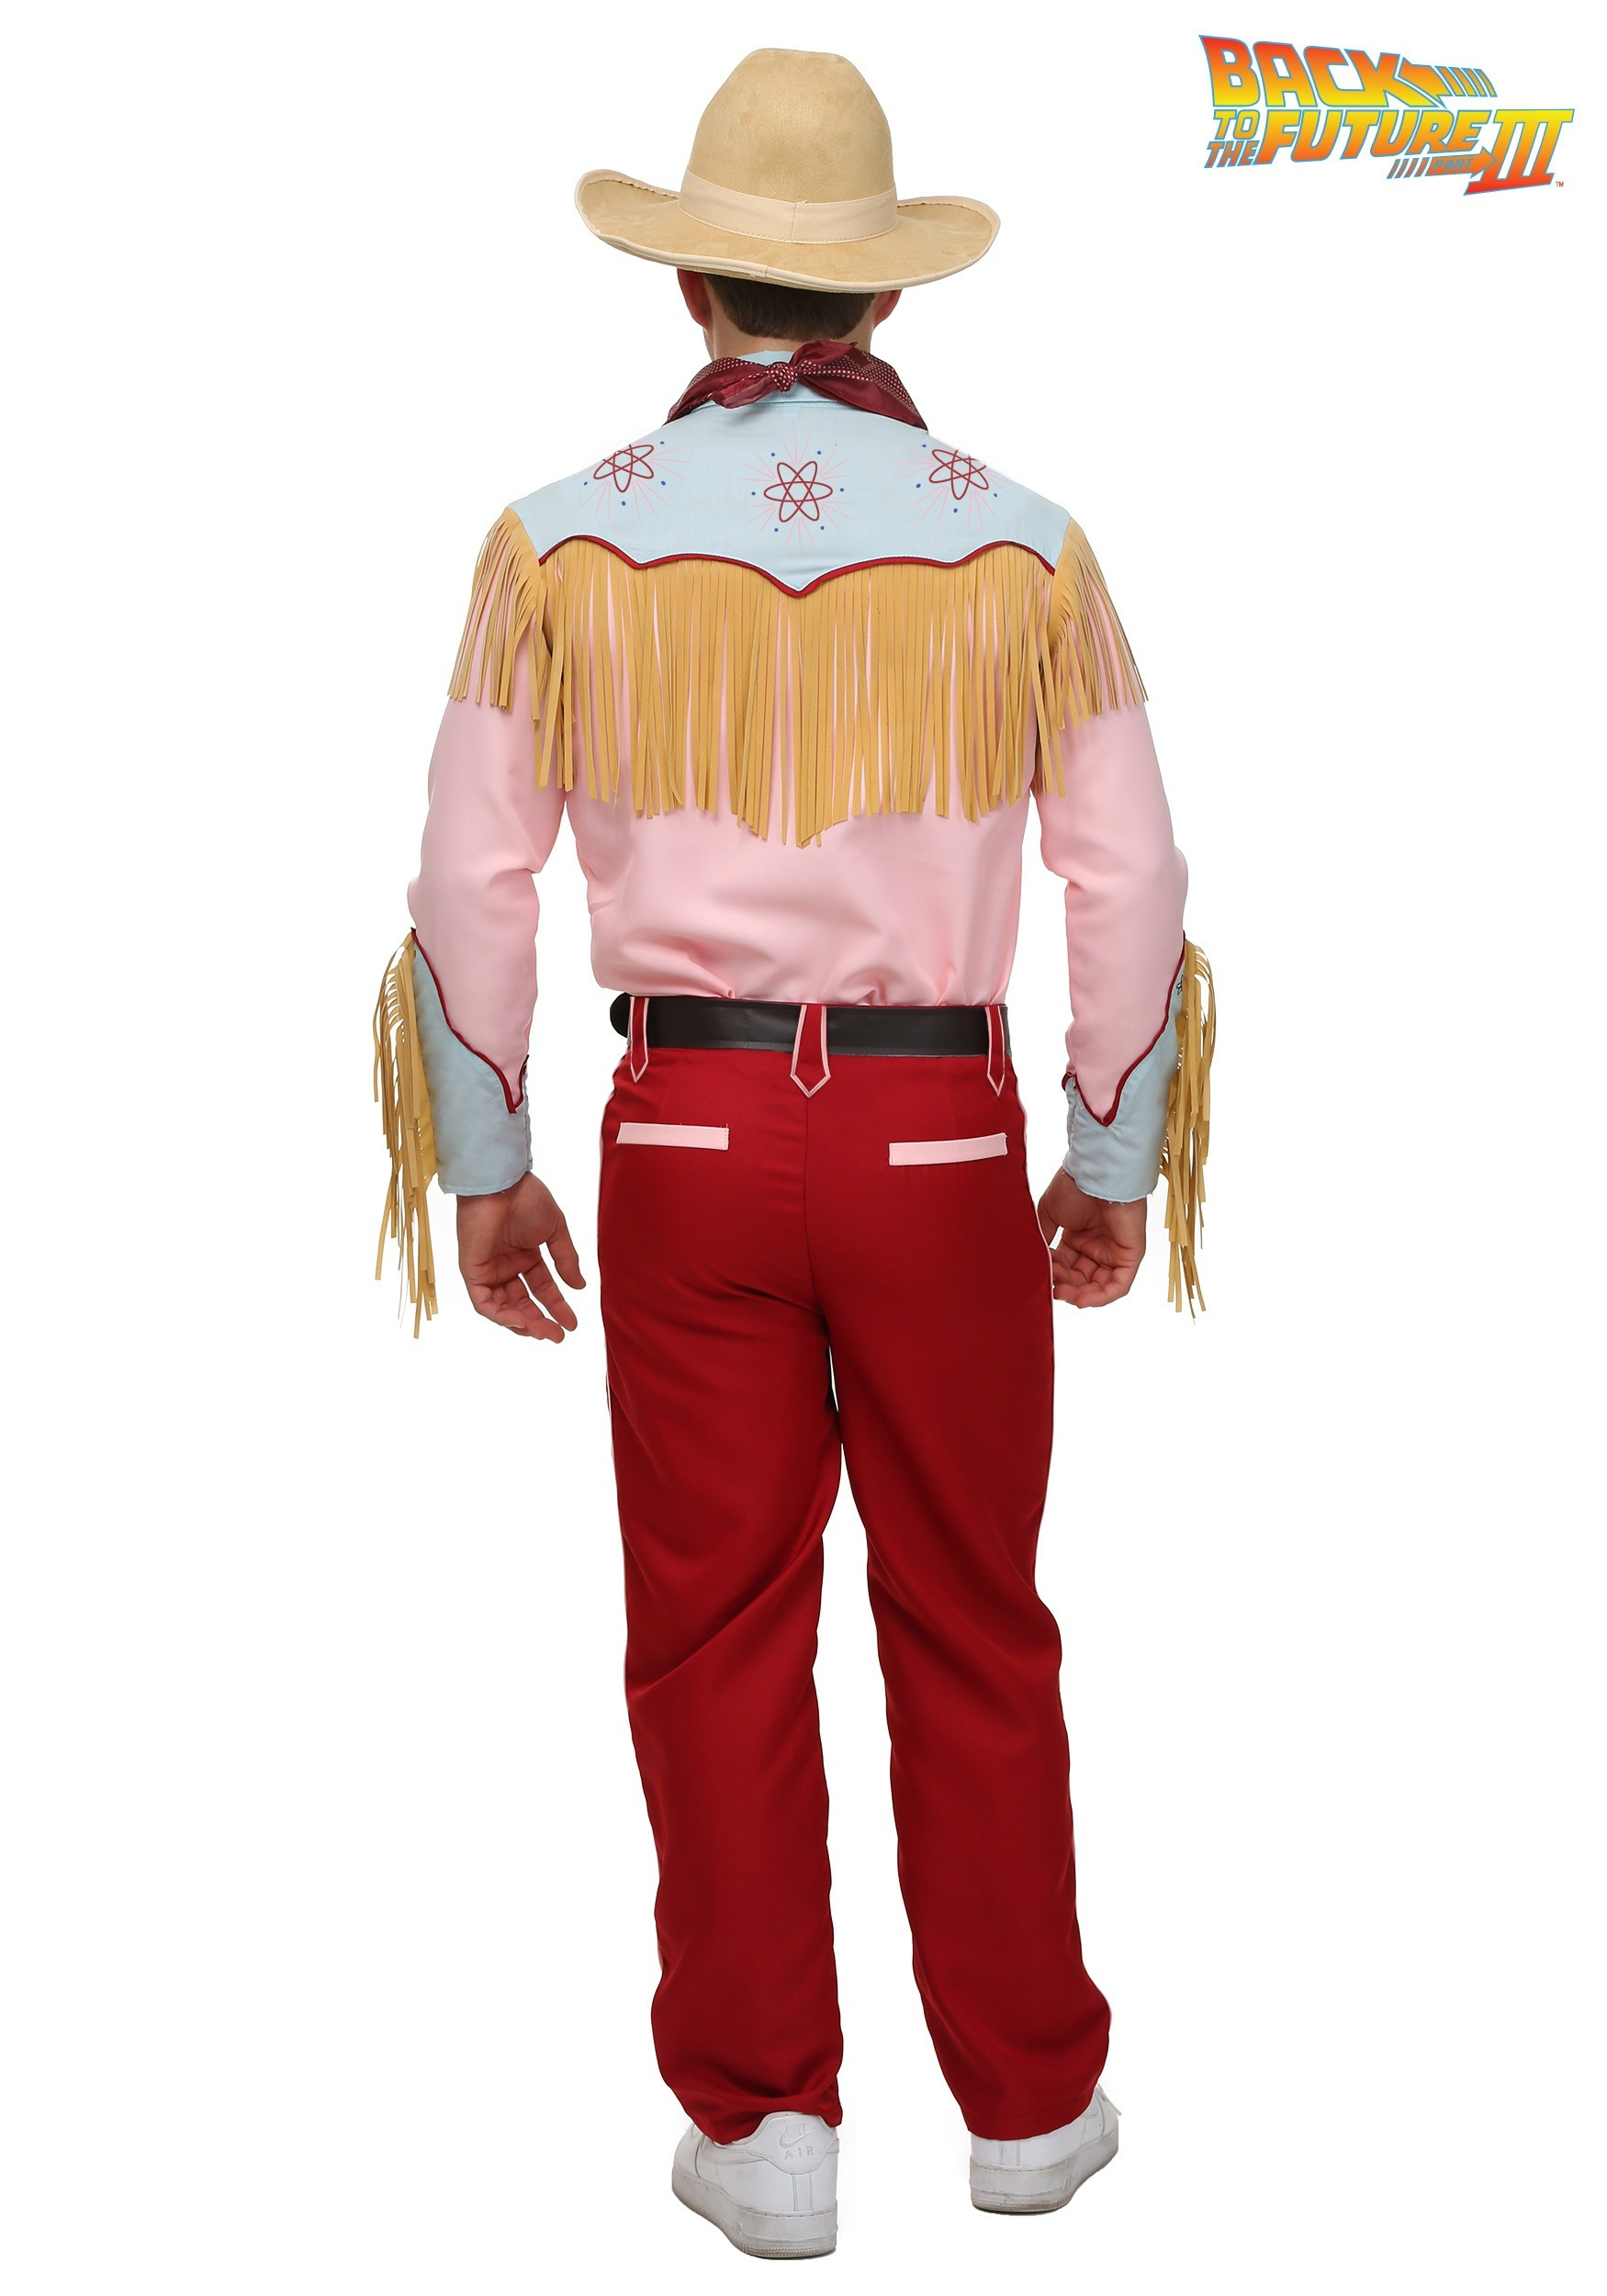 Marty mcfly cowboy